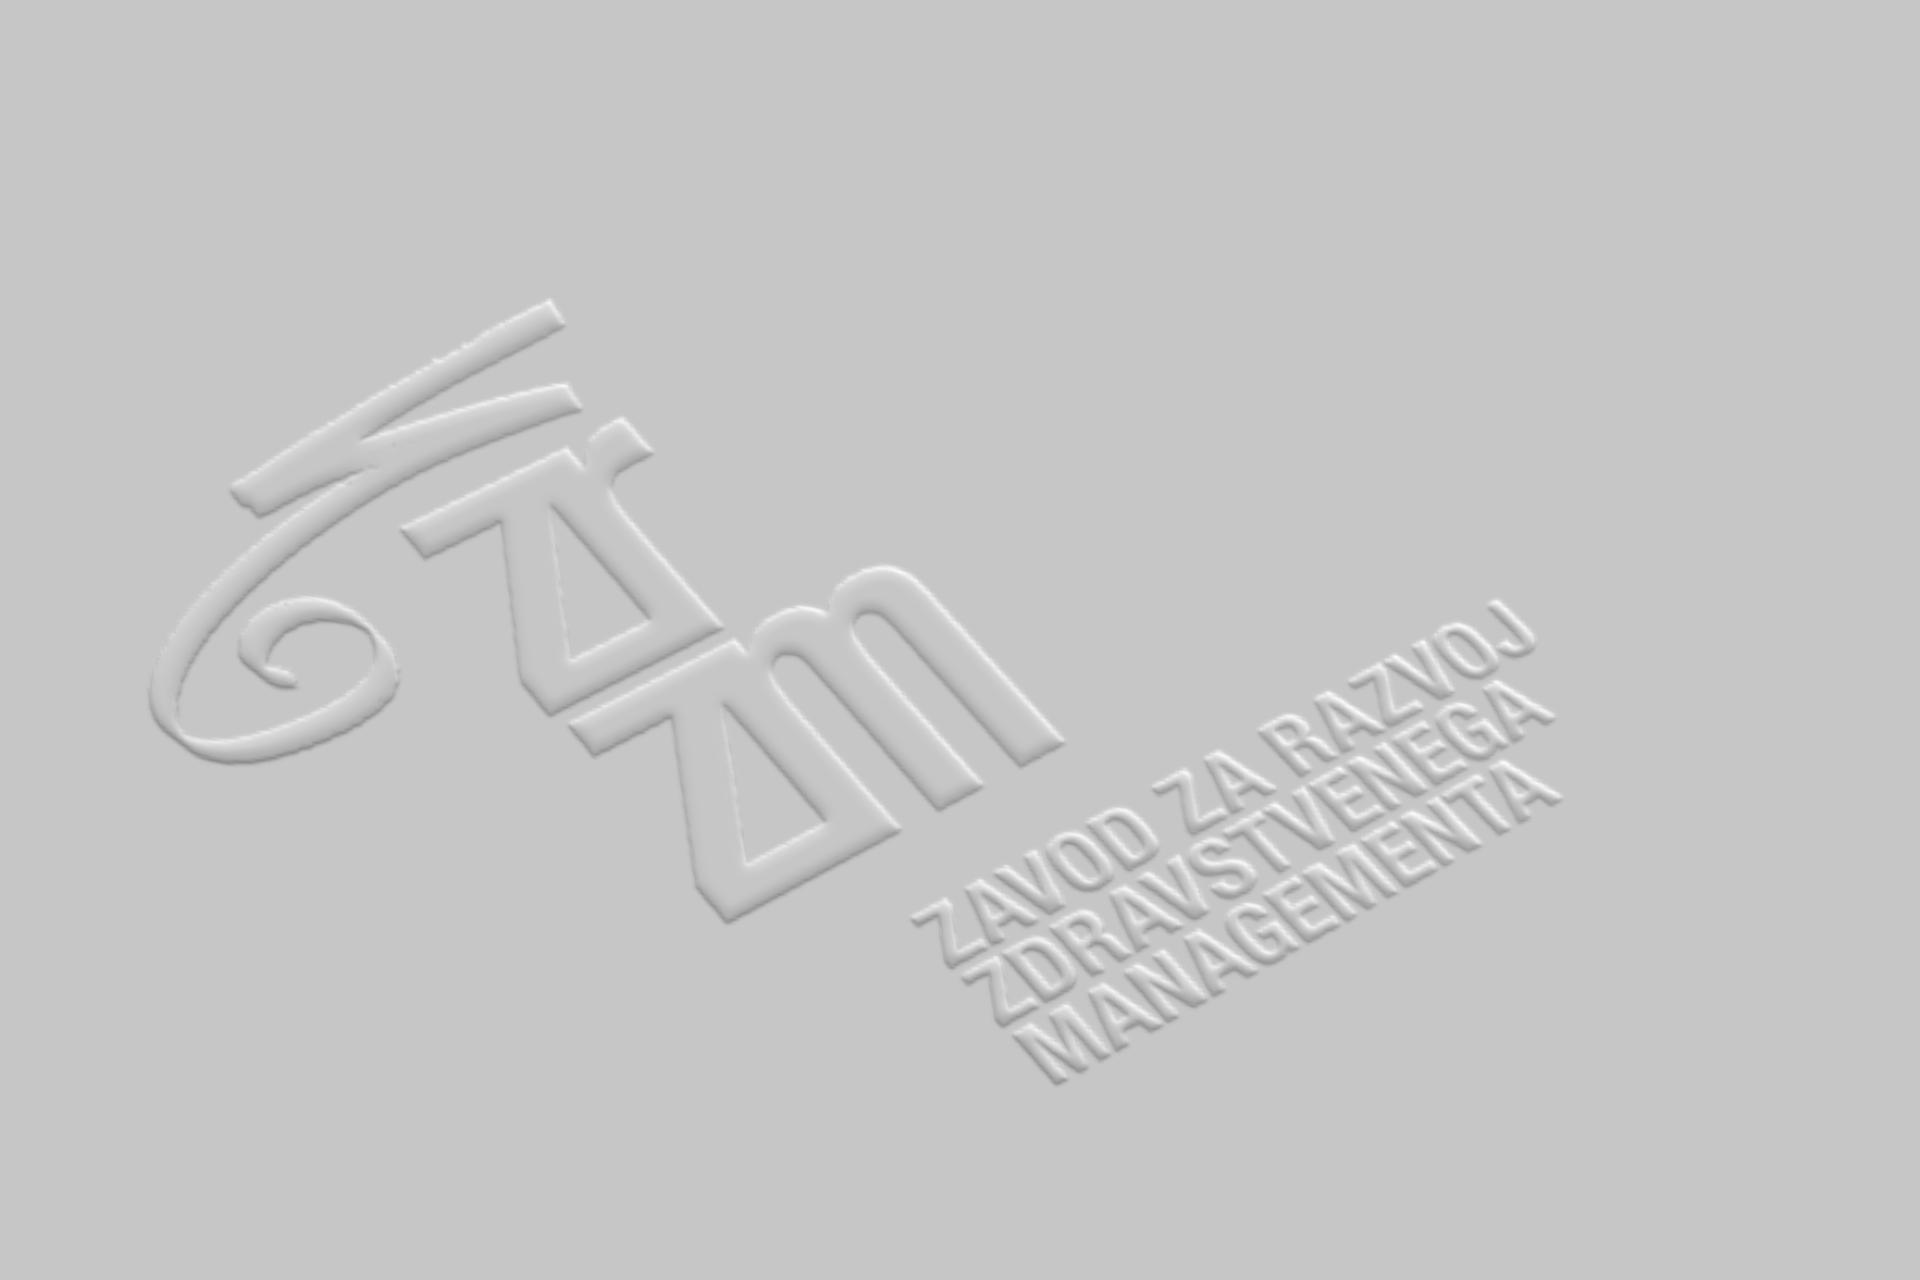 zrzm_logo_embossed_ma-ma